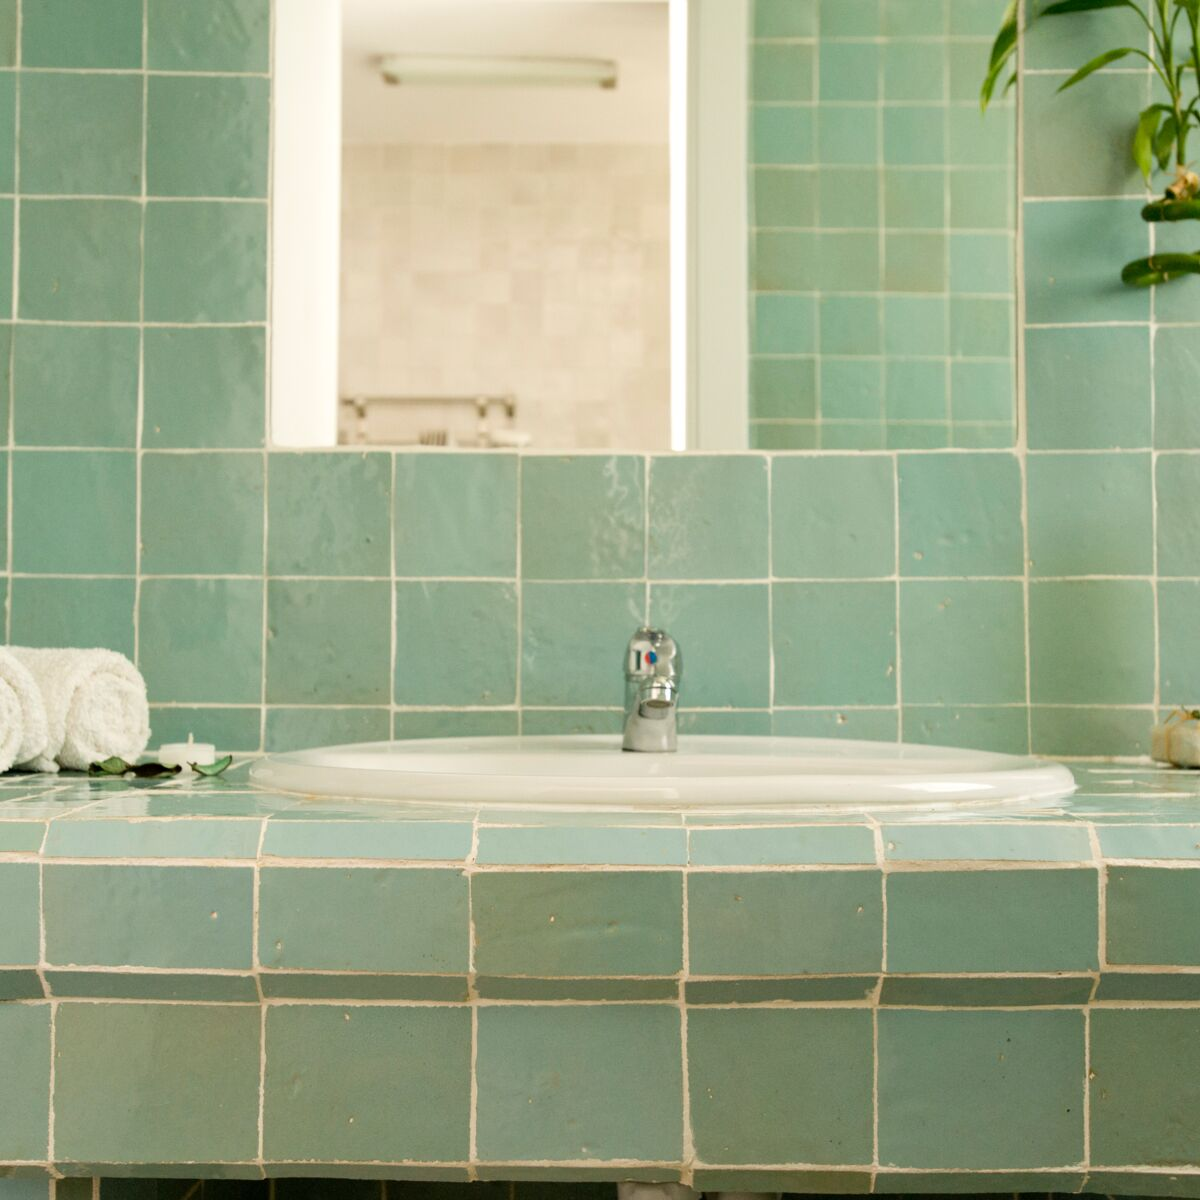 Zellige : comment adopter ce carrelage de salle de bain tendance